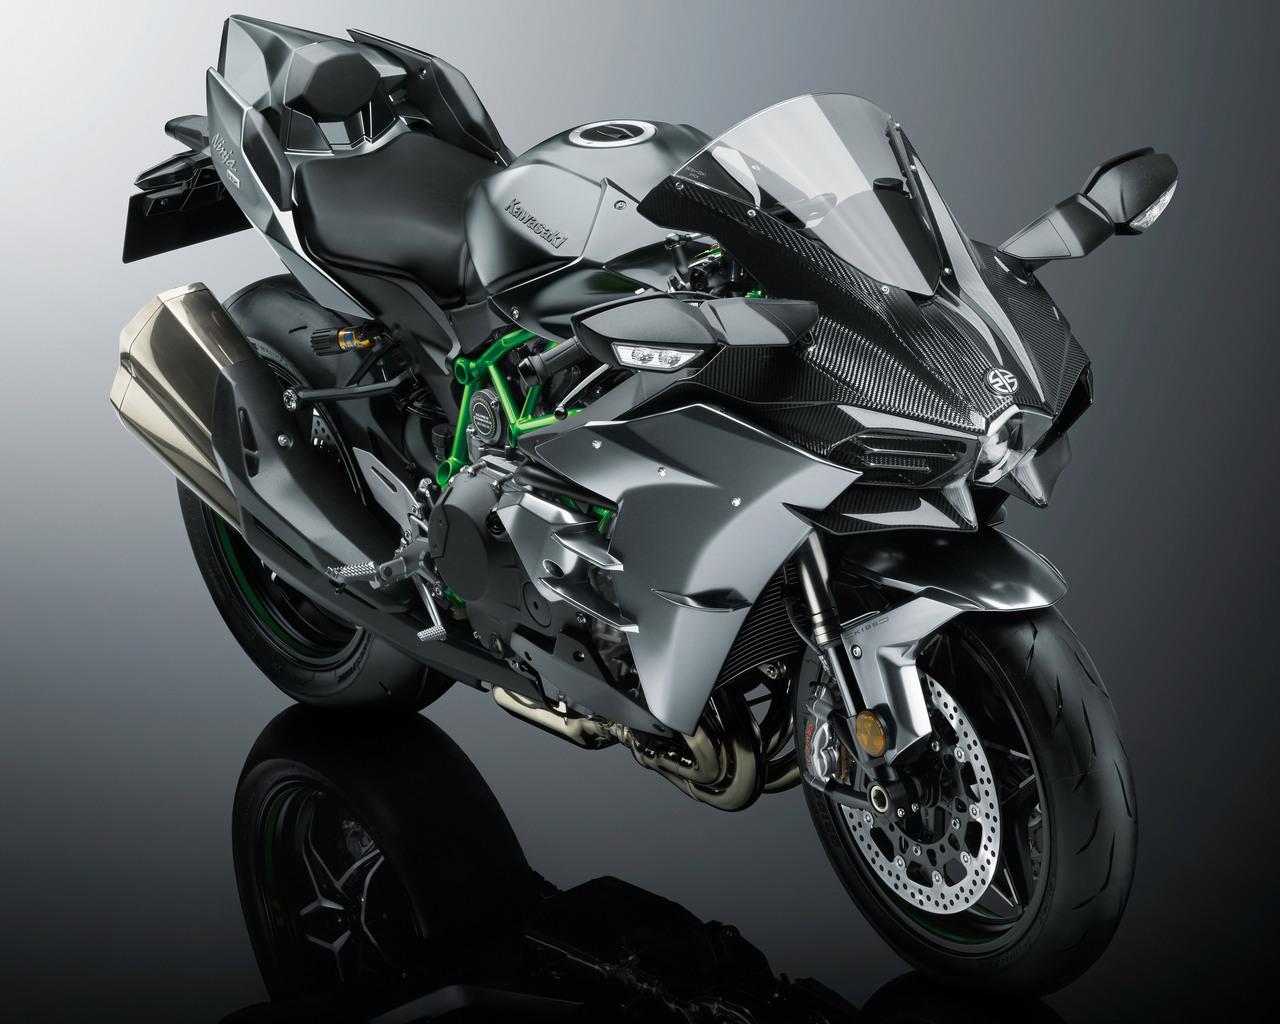 1280x1024 Kawasaki Ninja H2 1280x1024 Resolution HD 4k